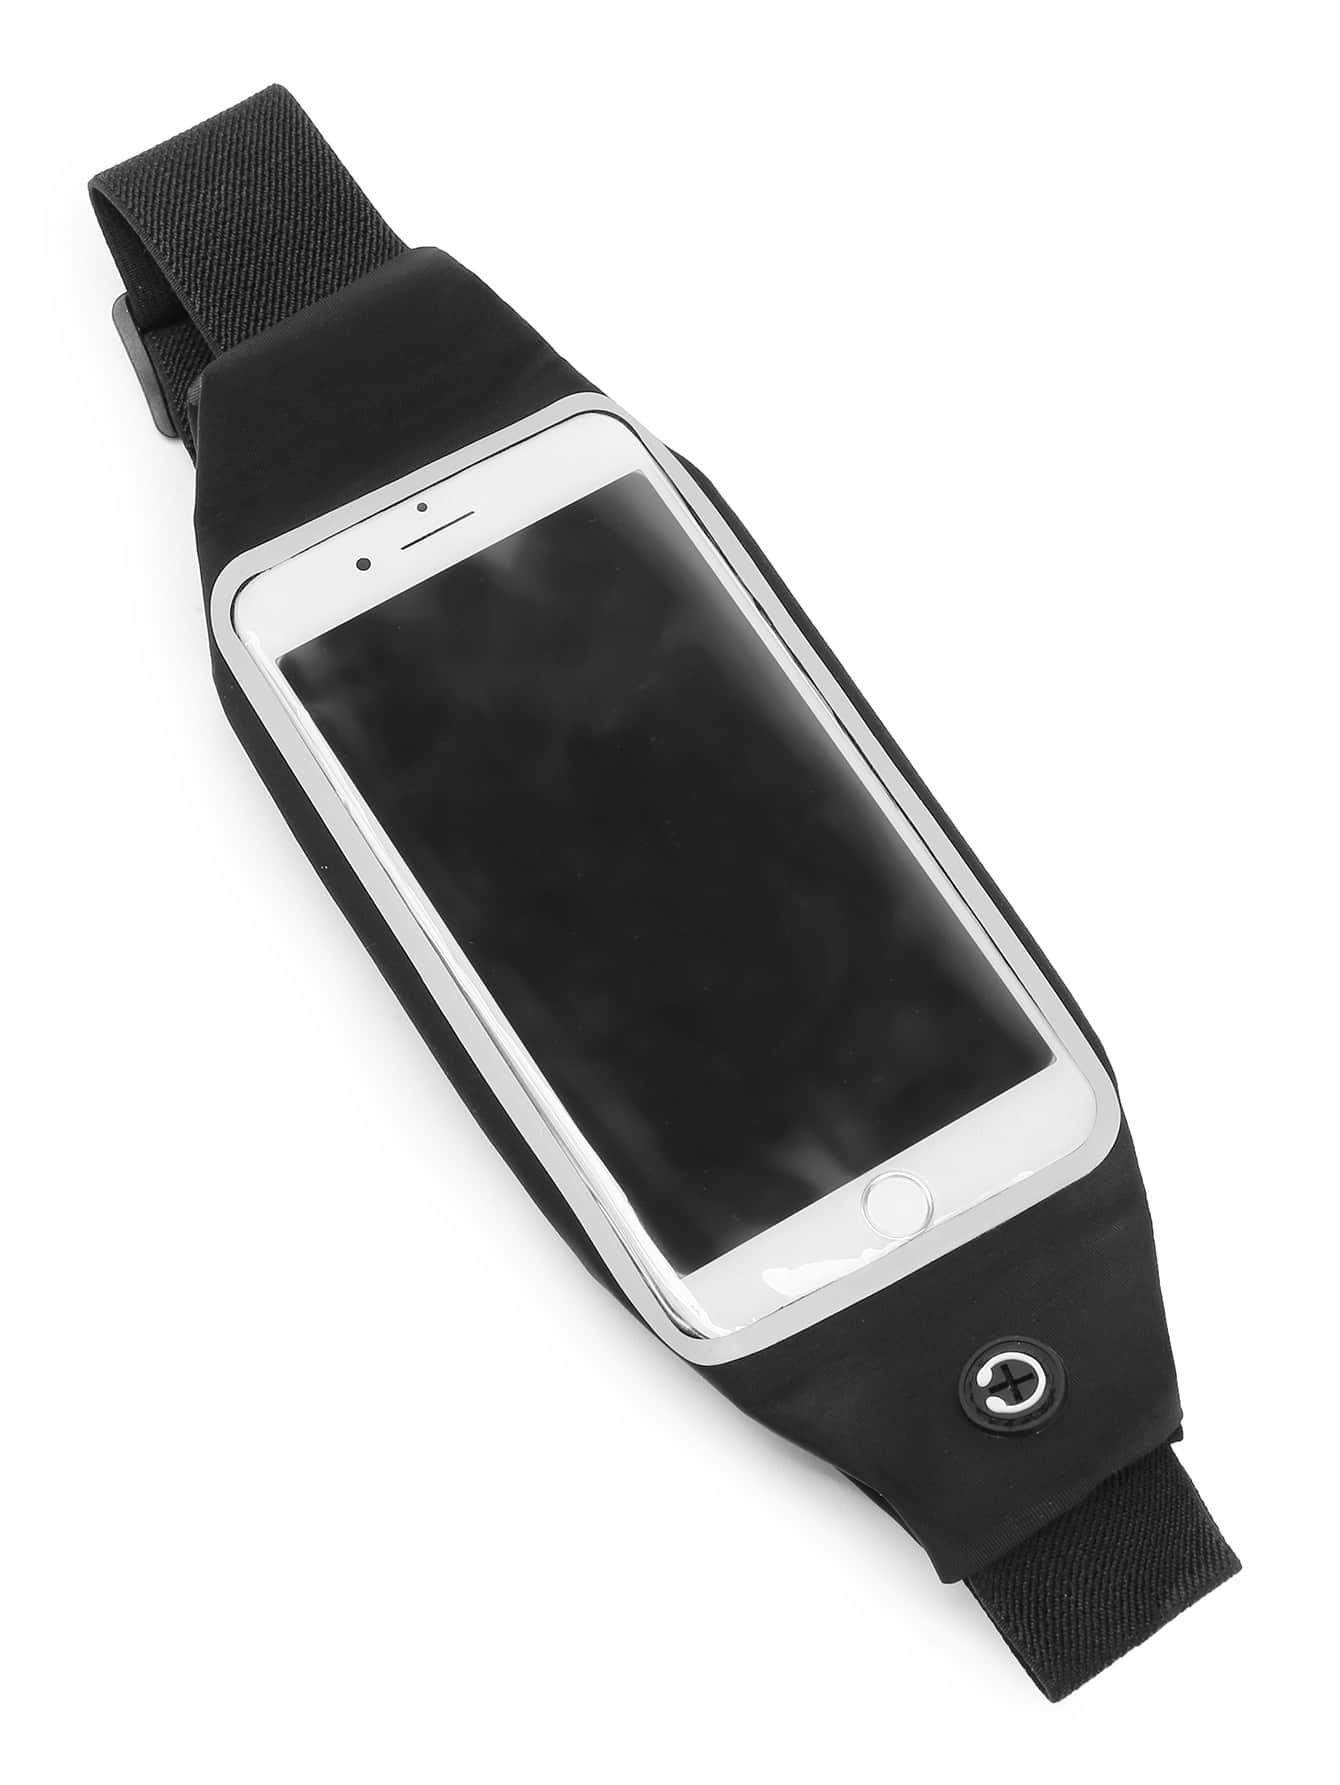 6 pouces de t l phone bumbag avec cran tactile french shein sheinside. Black Bedroom Furniture Sets. Home Design Ideas